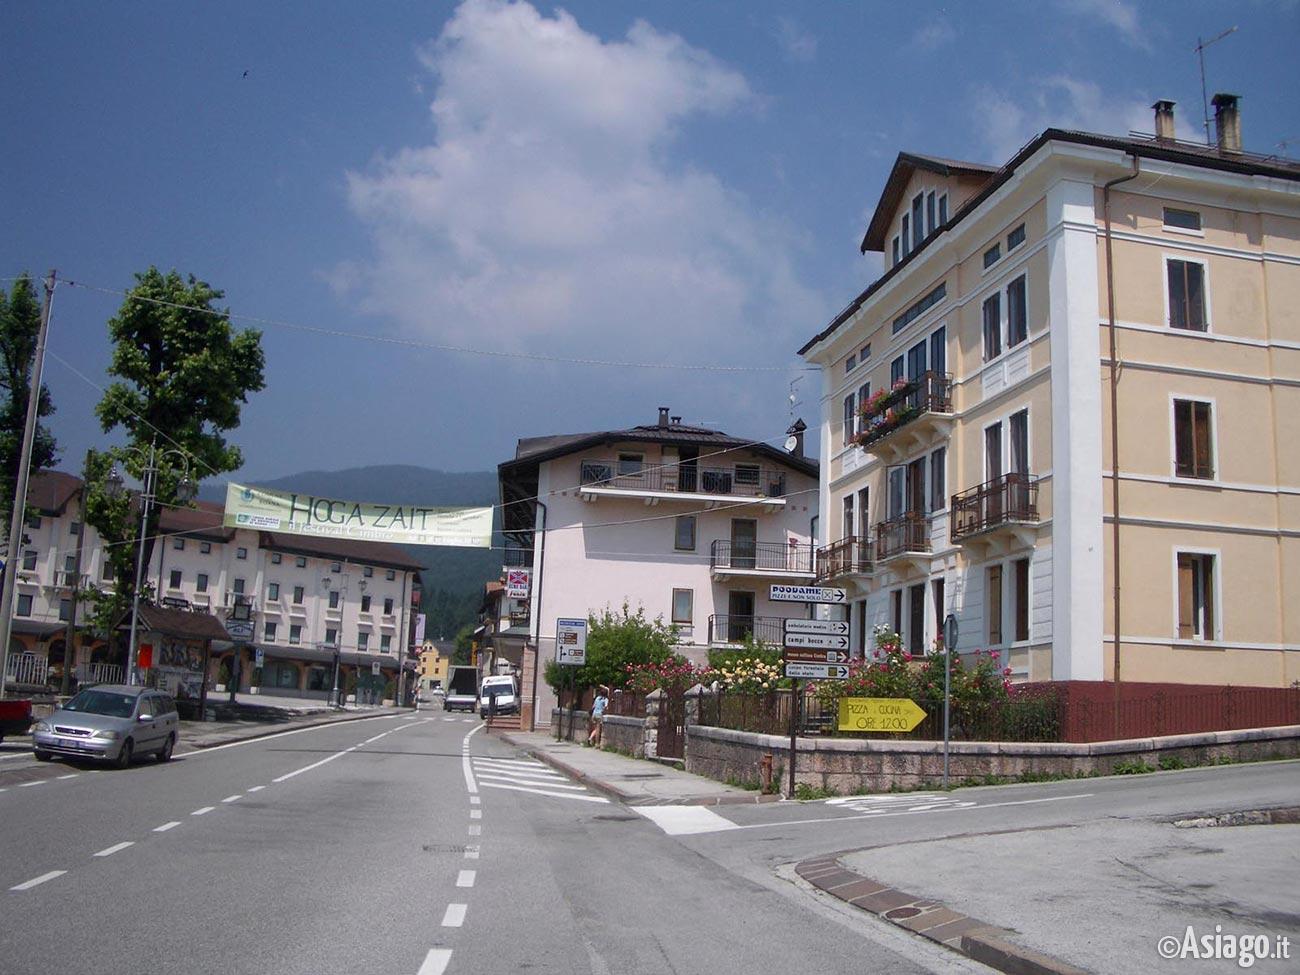 Roana b b monte verena fotos hochebene von asiago 7 for Altopiano asiago hotel